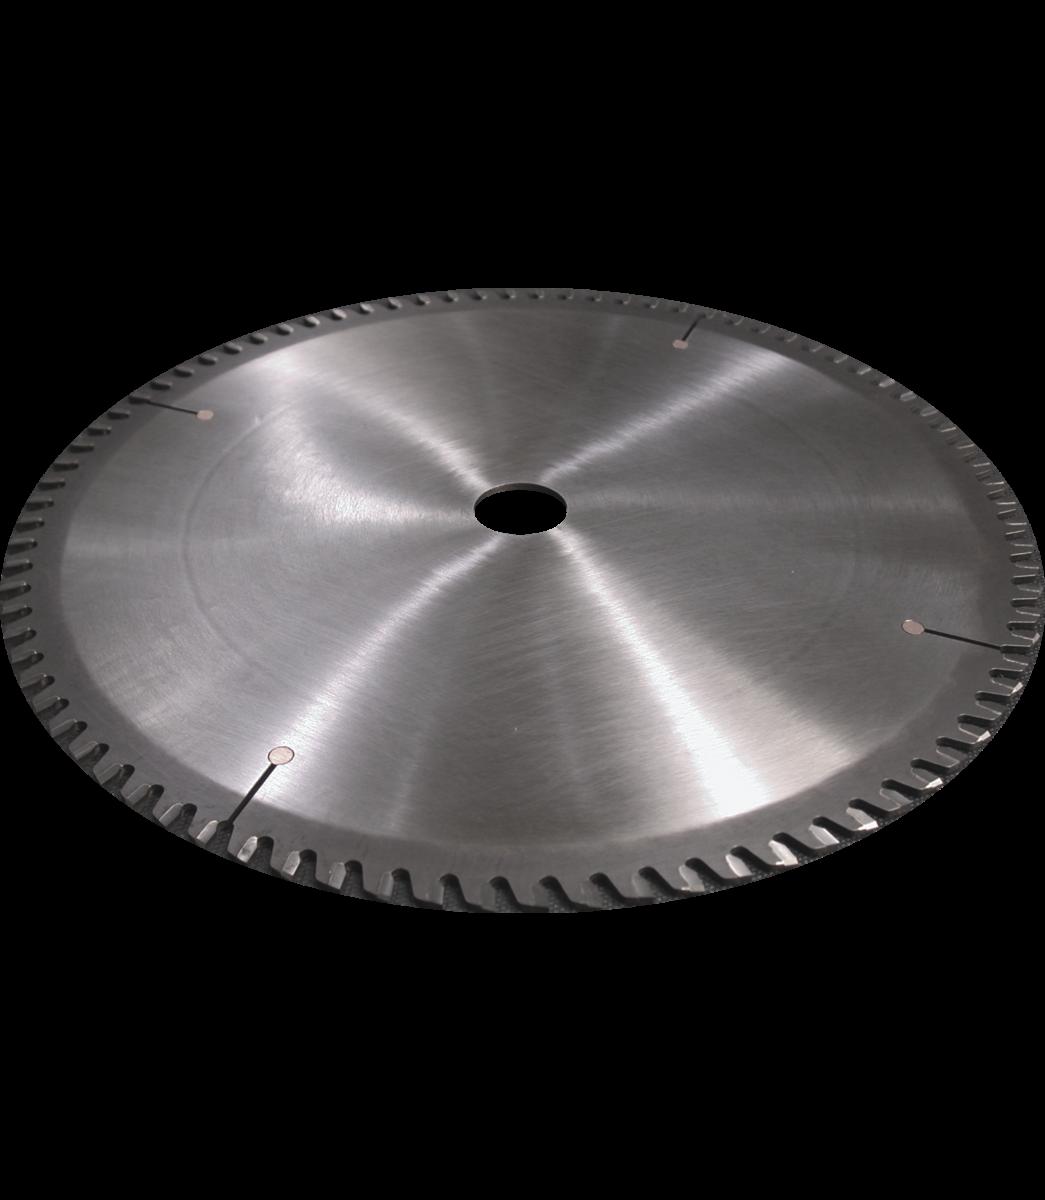 Ferrous Circular Saw Blade 350mm x 32mm x 2.5mm x 220T For J-FK350-2/4K